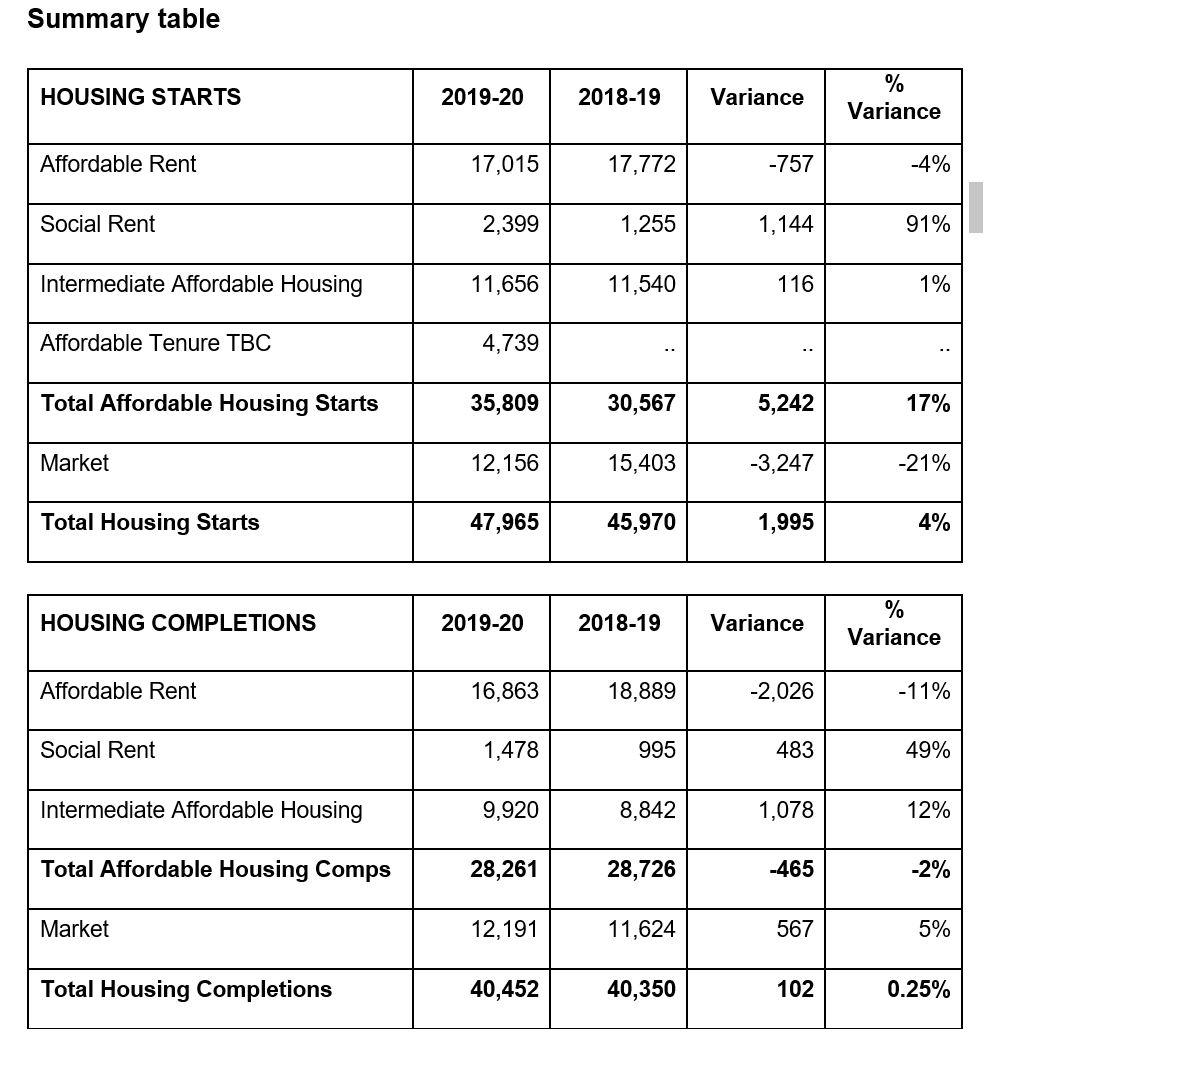 Housing statistics 2019-20 summary table